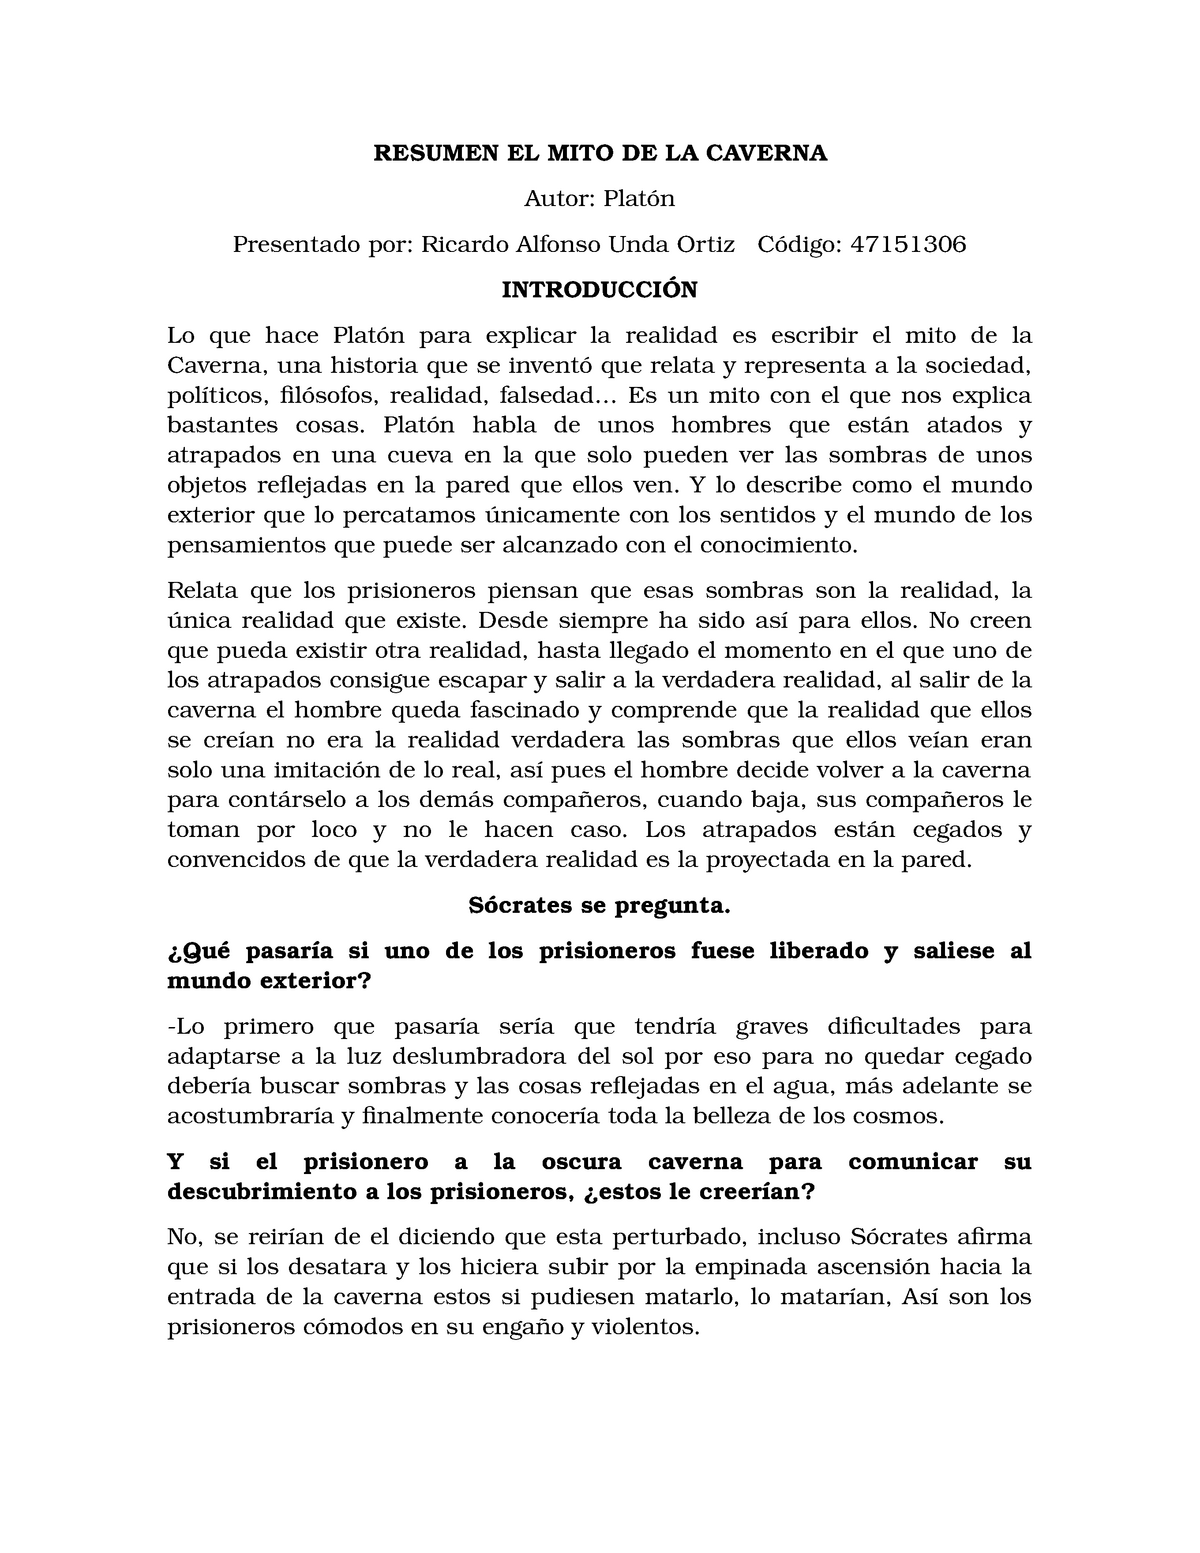 Resumen El Mito De La Caverna Español Studocu